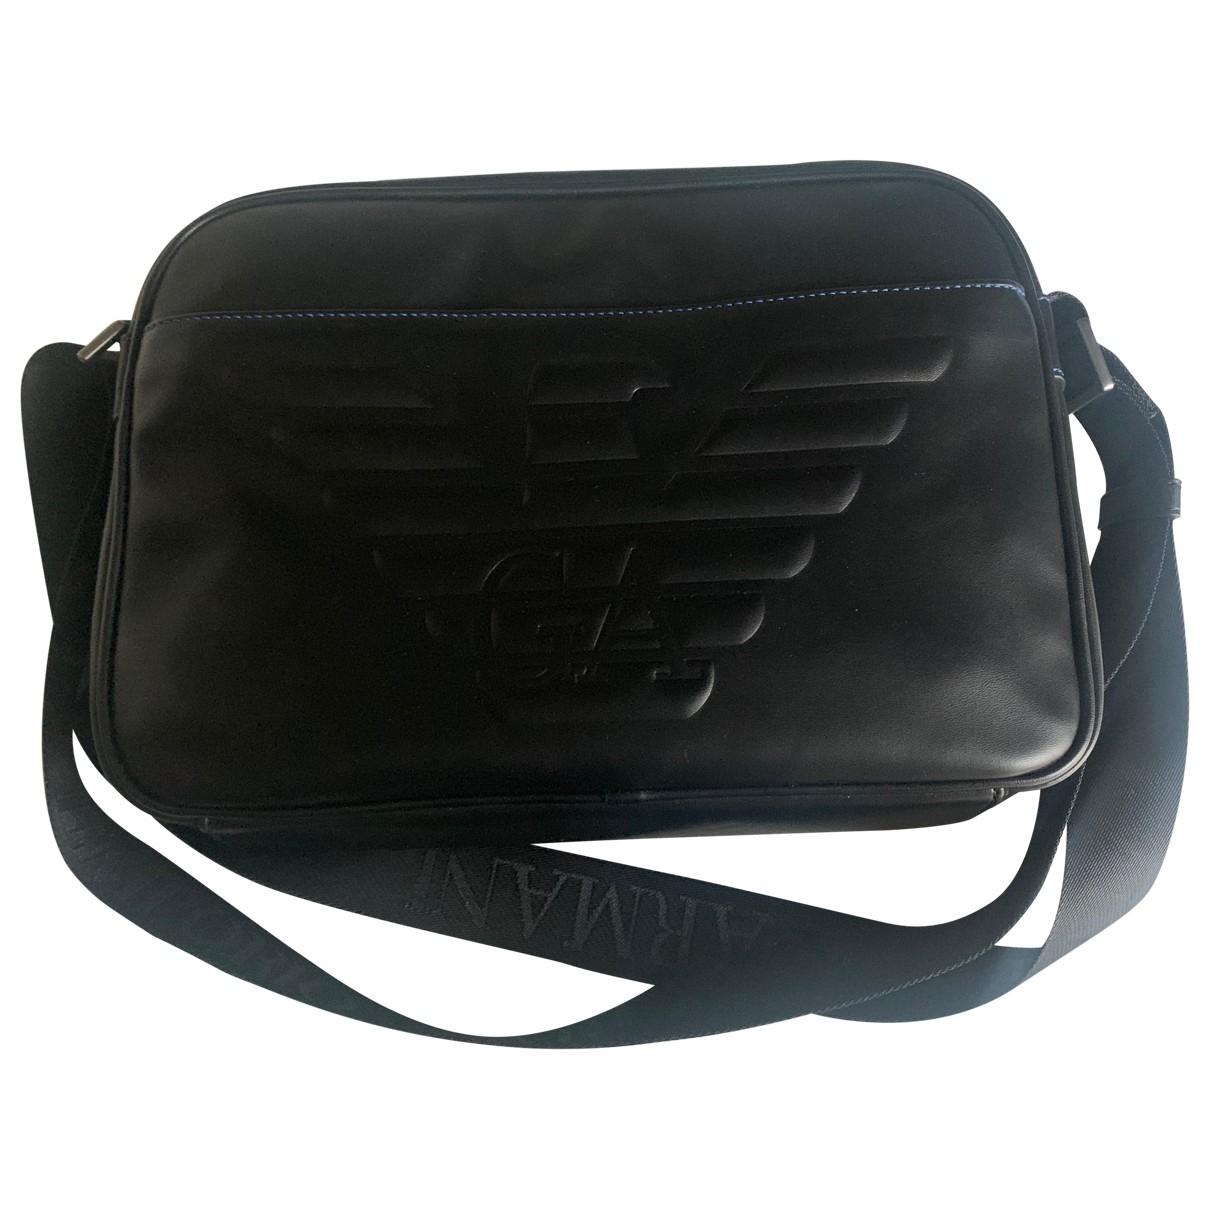 Emporio Armani \N Black Leather bag for Men \N